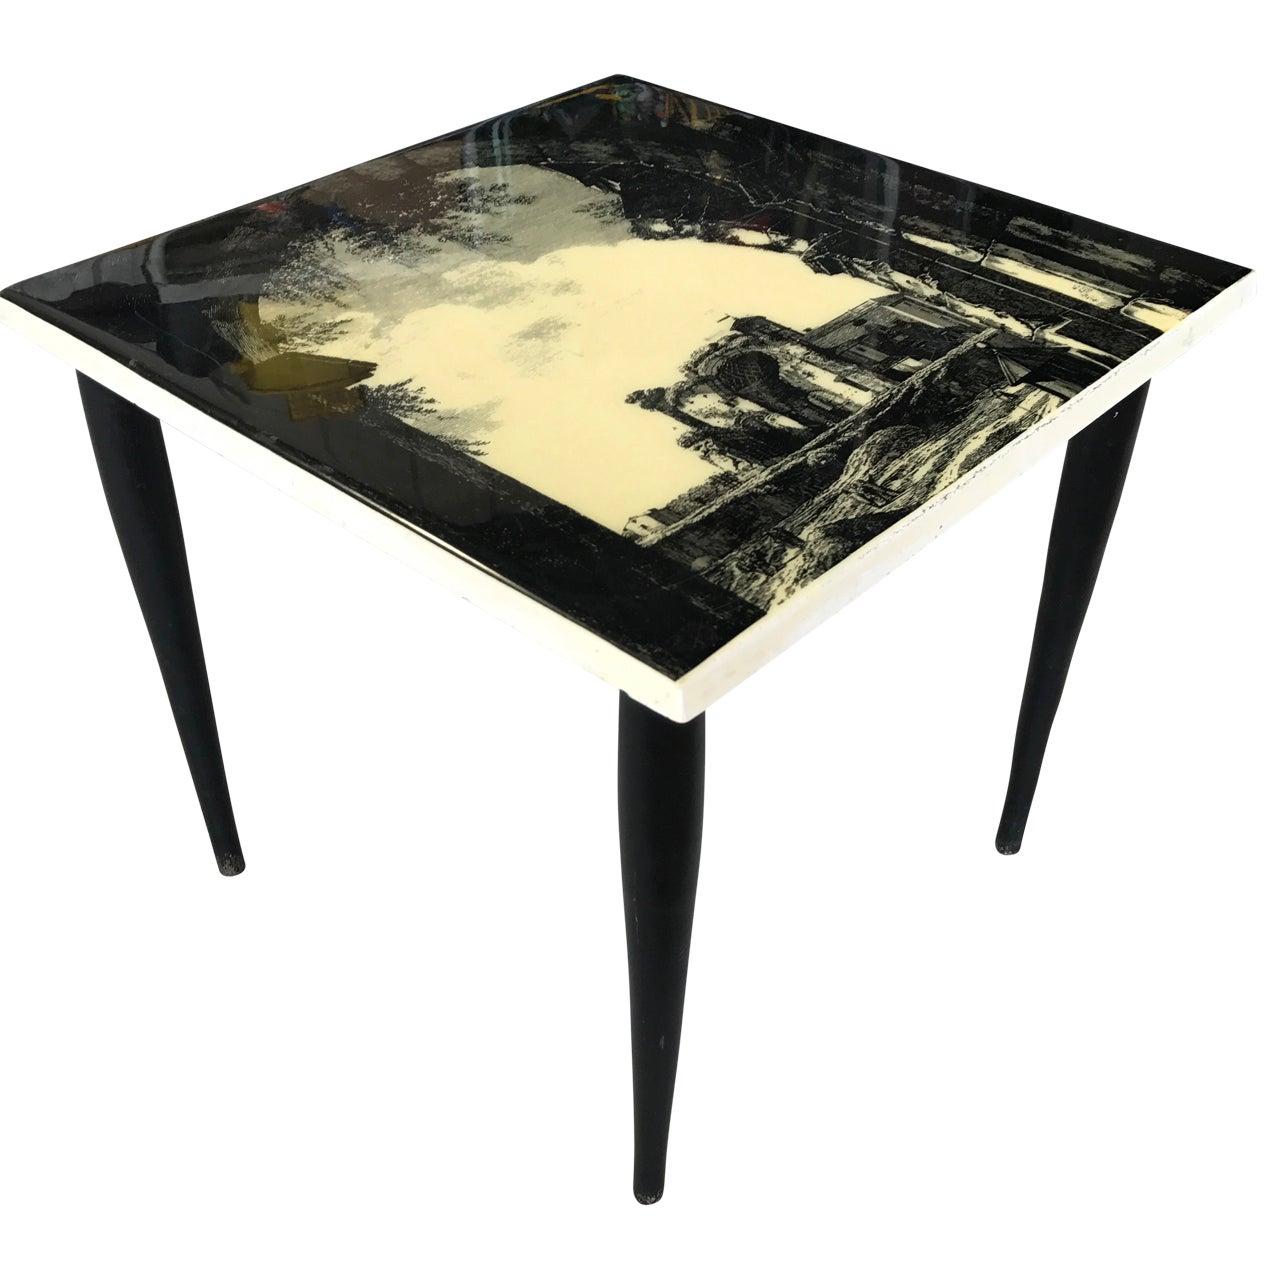 Small Italian Mid-Century Modern Side Table, 1950s